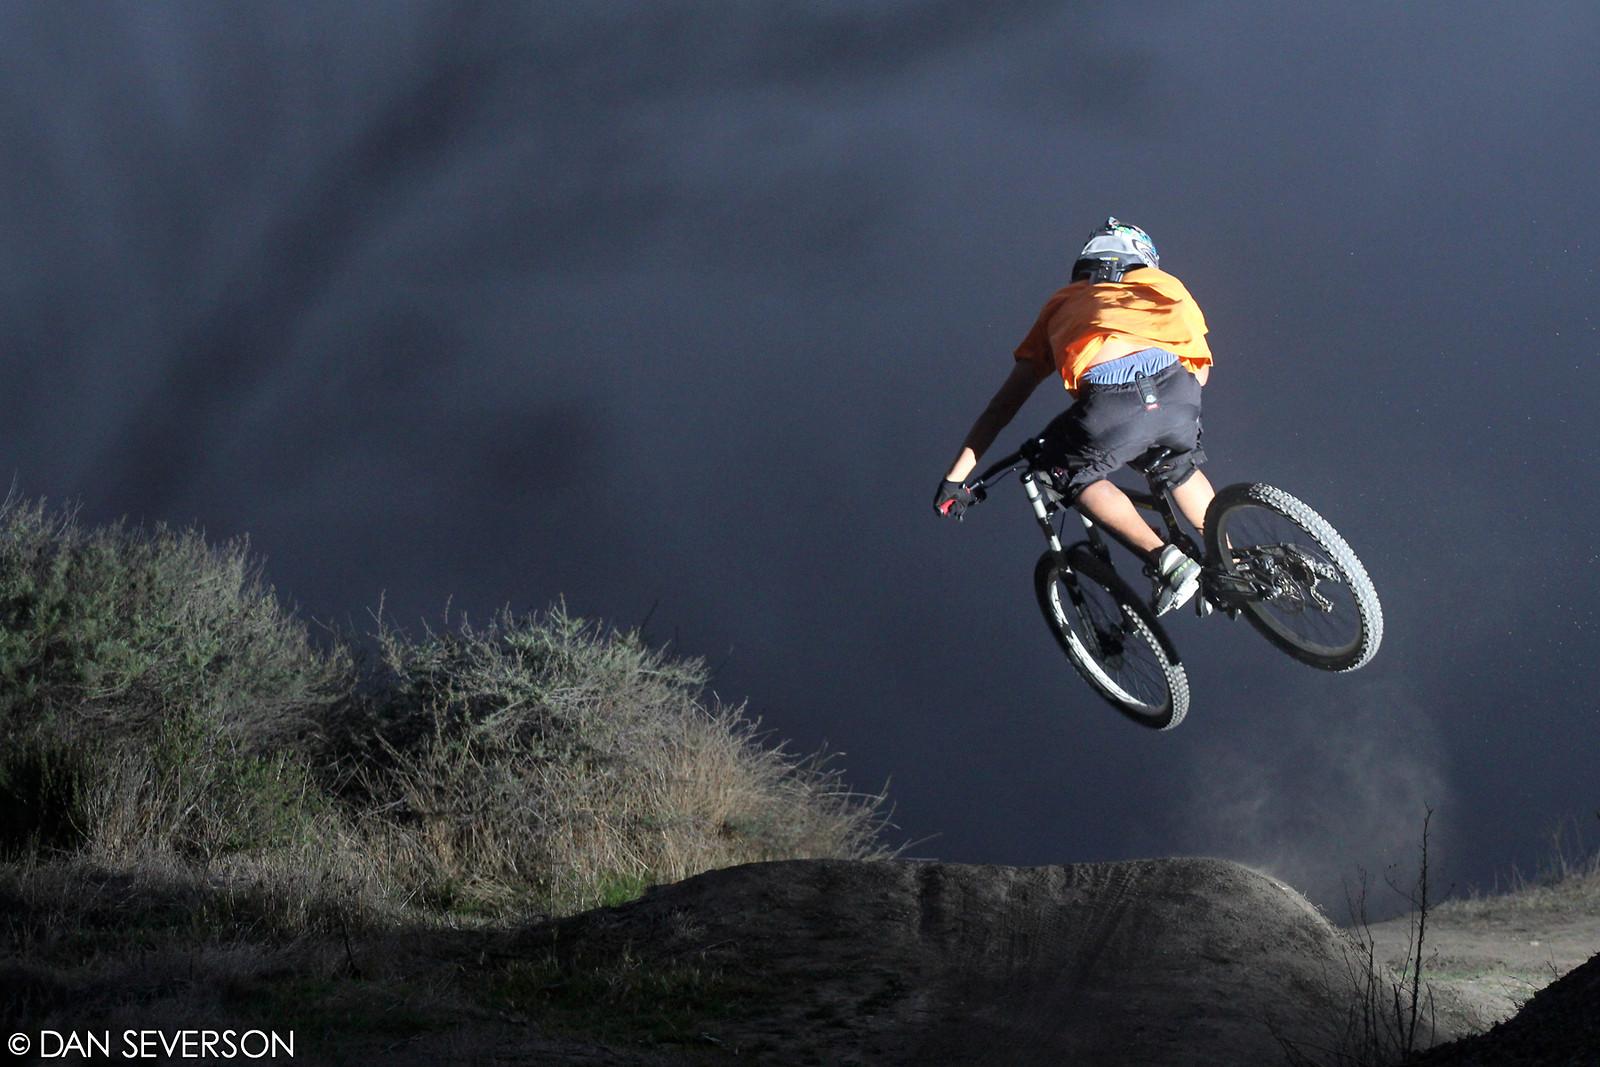 Z-WAAAAAZ  - danseverson photo - Mountain Biking Pictures - Vital MTB